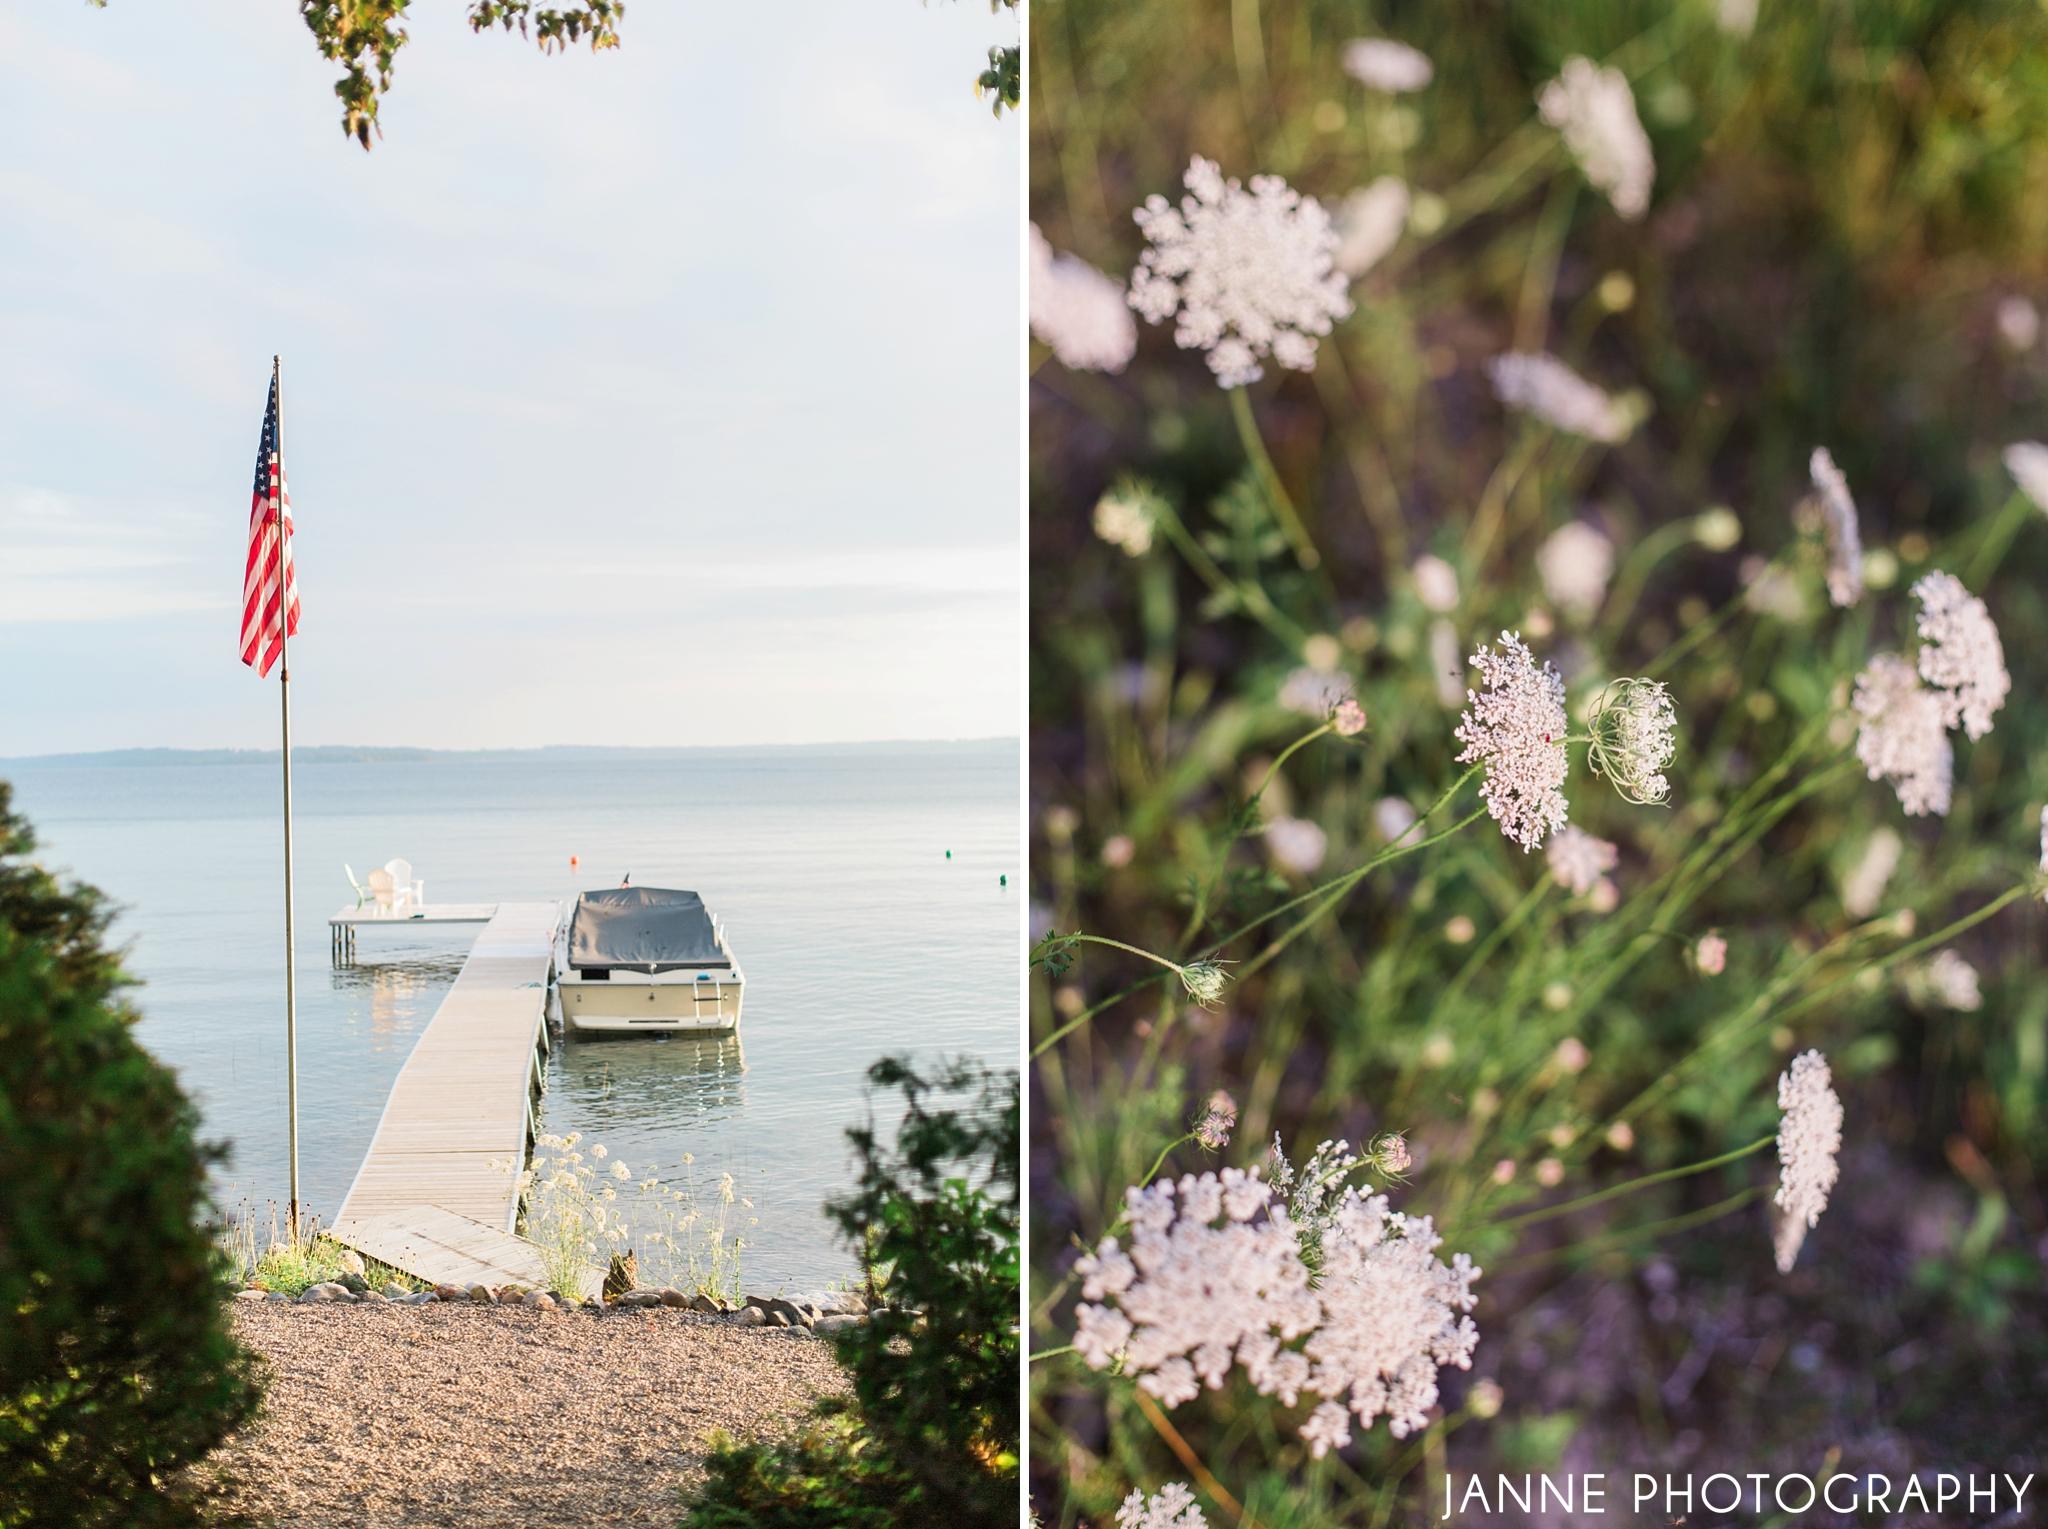 Omena_Traverse_City_Michigan_Photographer